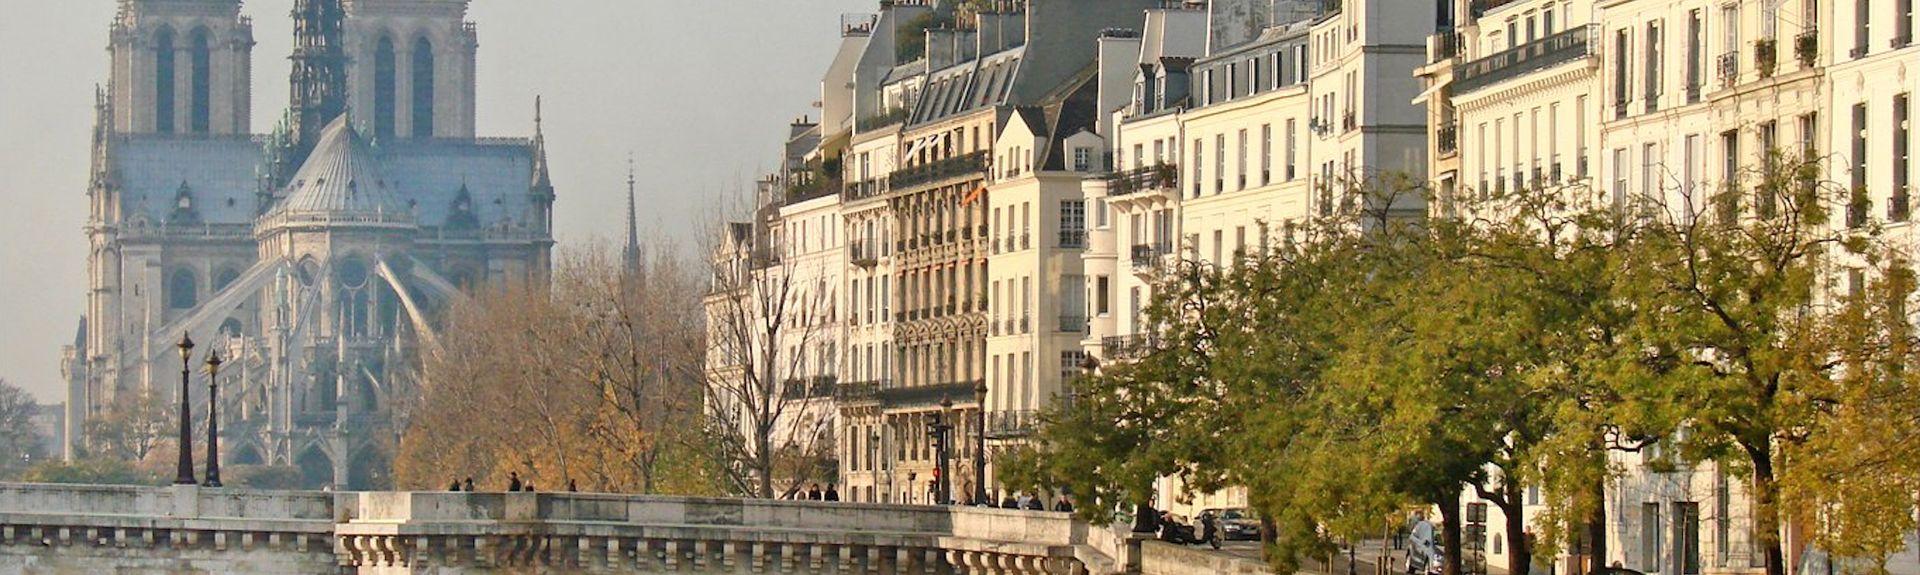 Quartier de l'Horloge, Paris, France